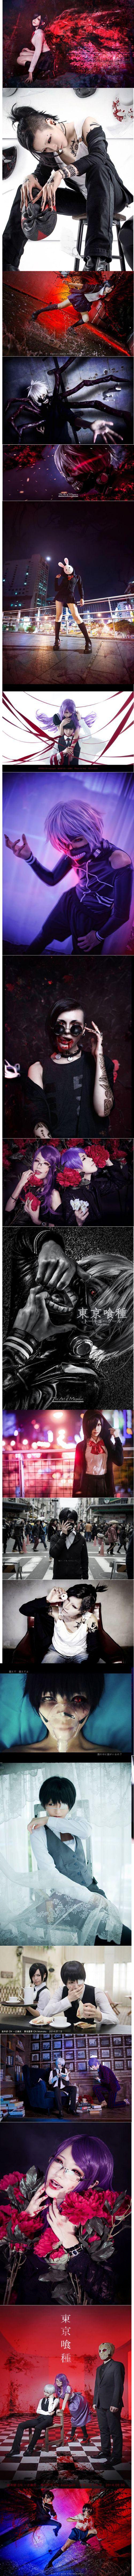 Tokyo ghoul - Shuu Tsukiyama/Gourmet, Uta, Rize Kamishiro/La glotona, Touka Kirishima, Ayato Kirishima, Yakumo Oomori/Yamori/Jason (Ghoul) Ken Kaneki (Ghoul artificial de un ojo)